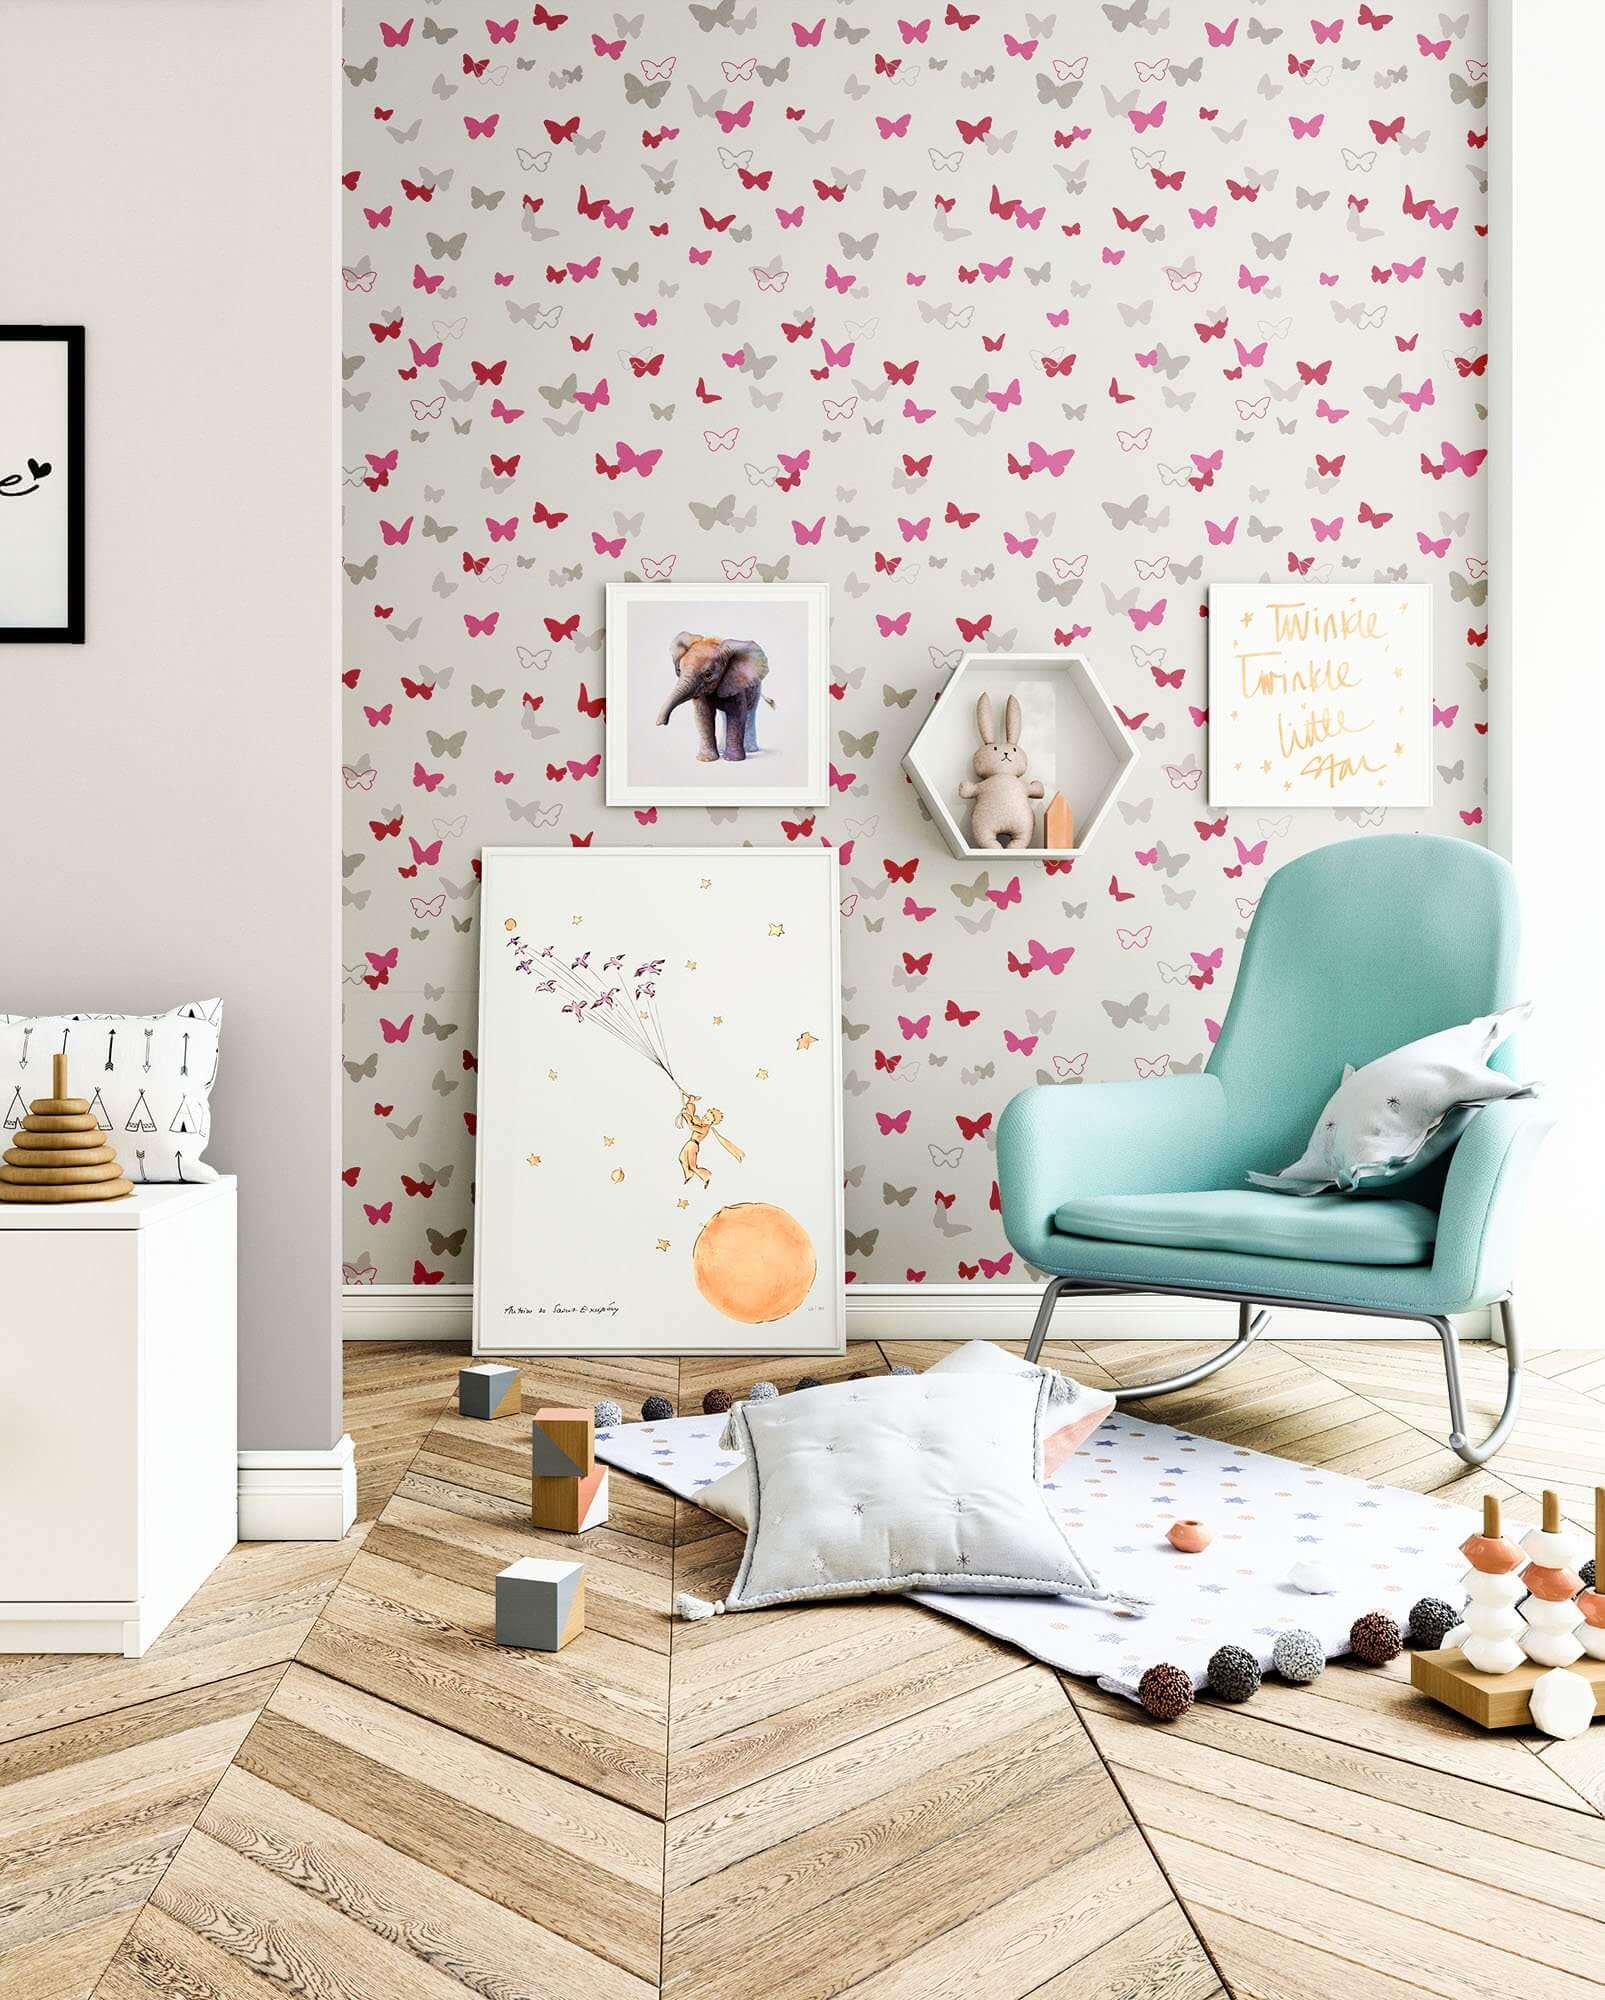 Vliestapete - Rosa - Natur - - Schmetterlinge - Kinder - newroom